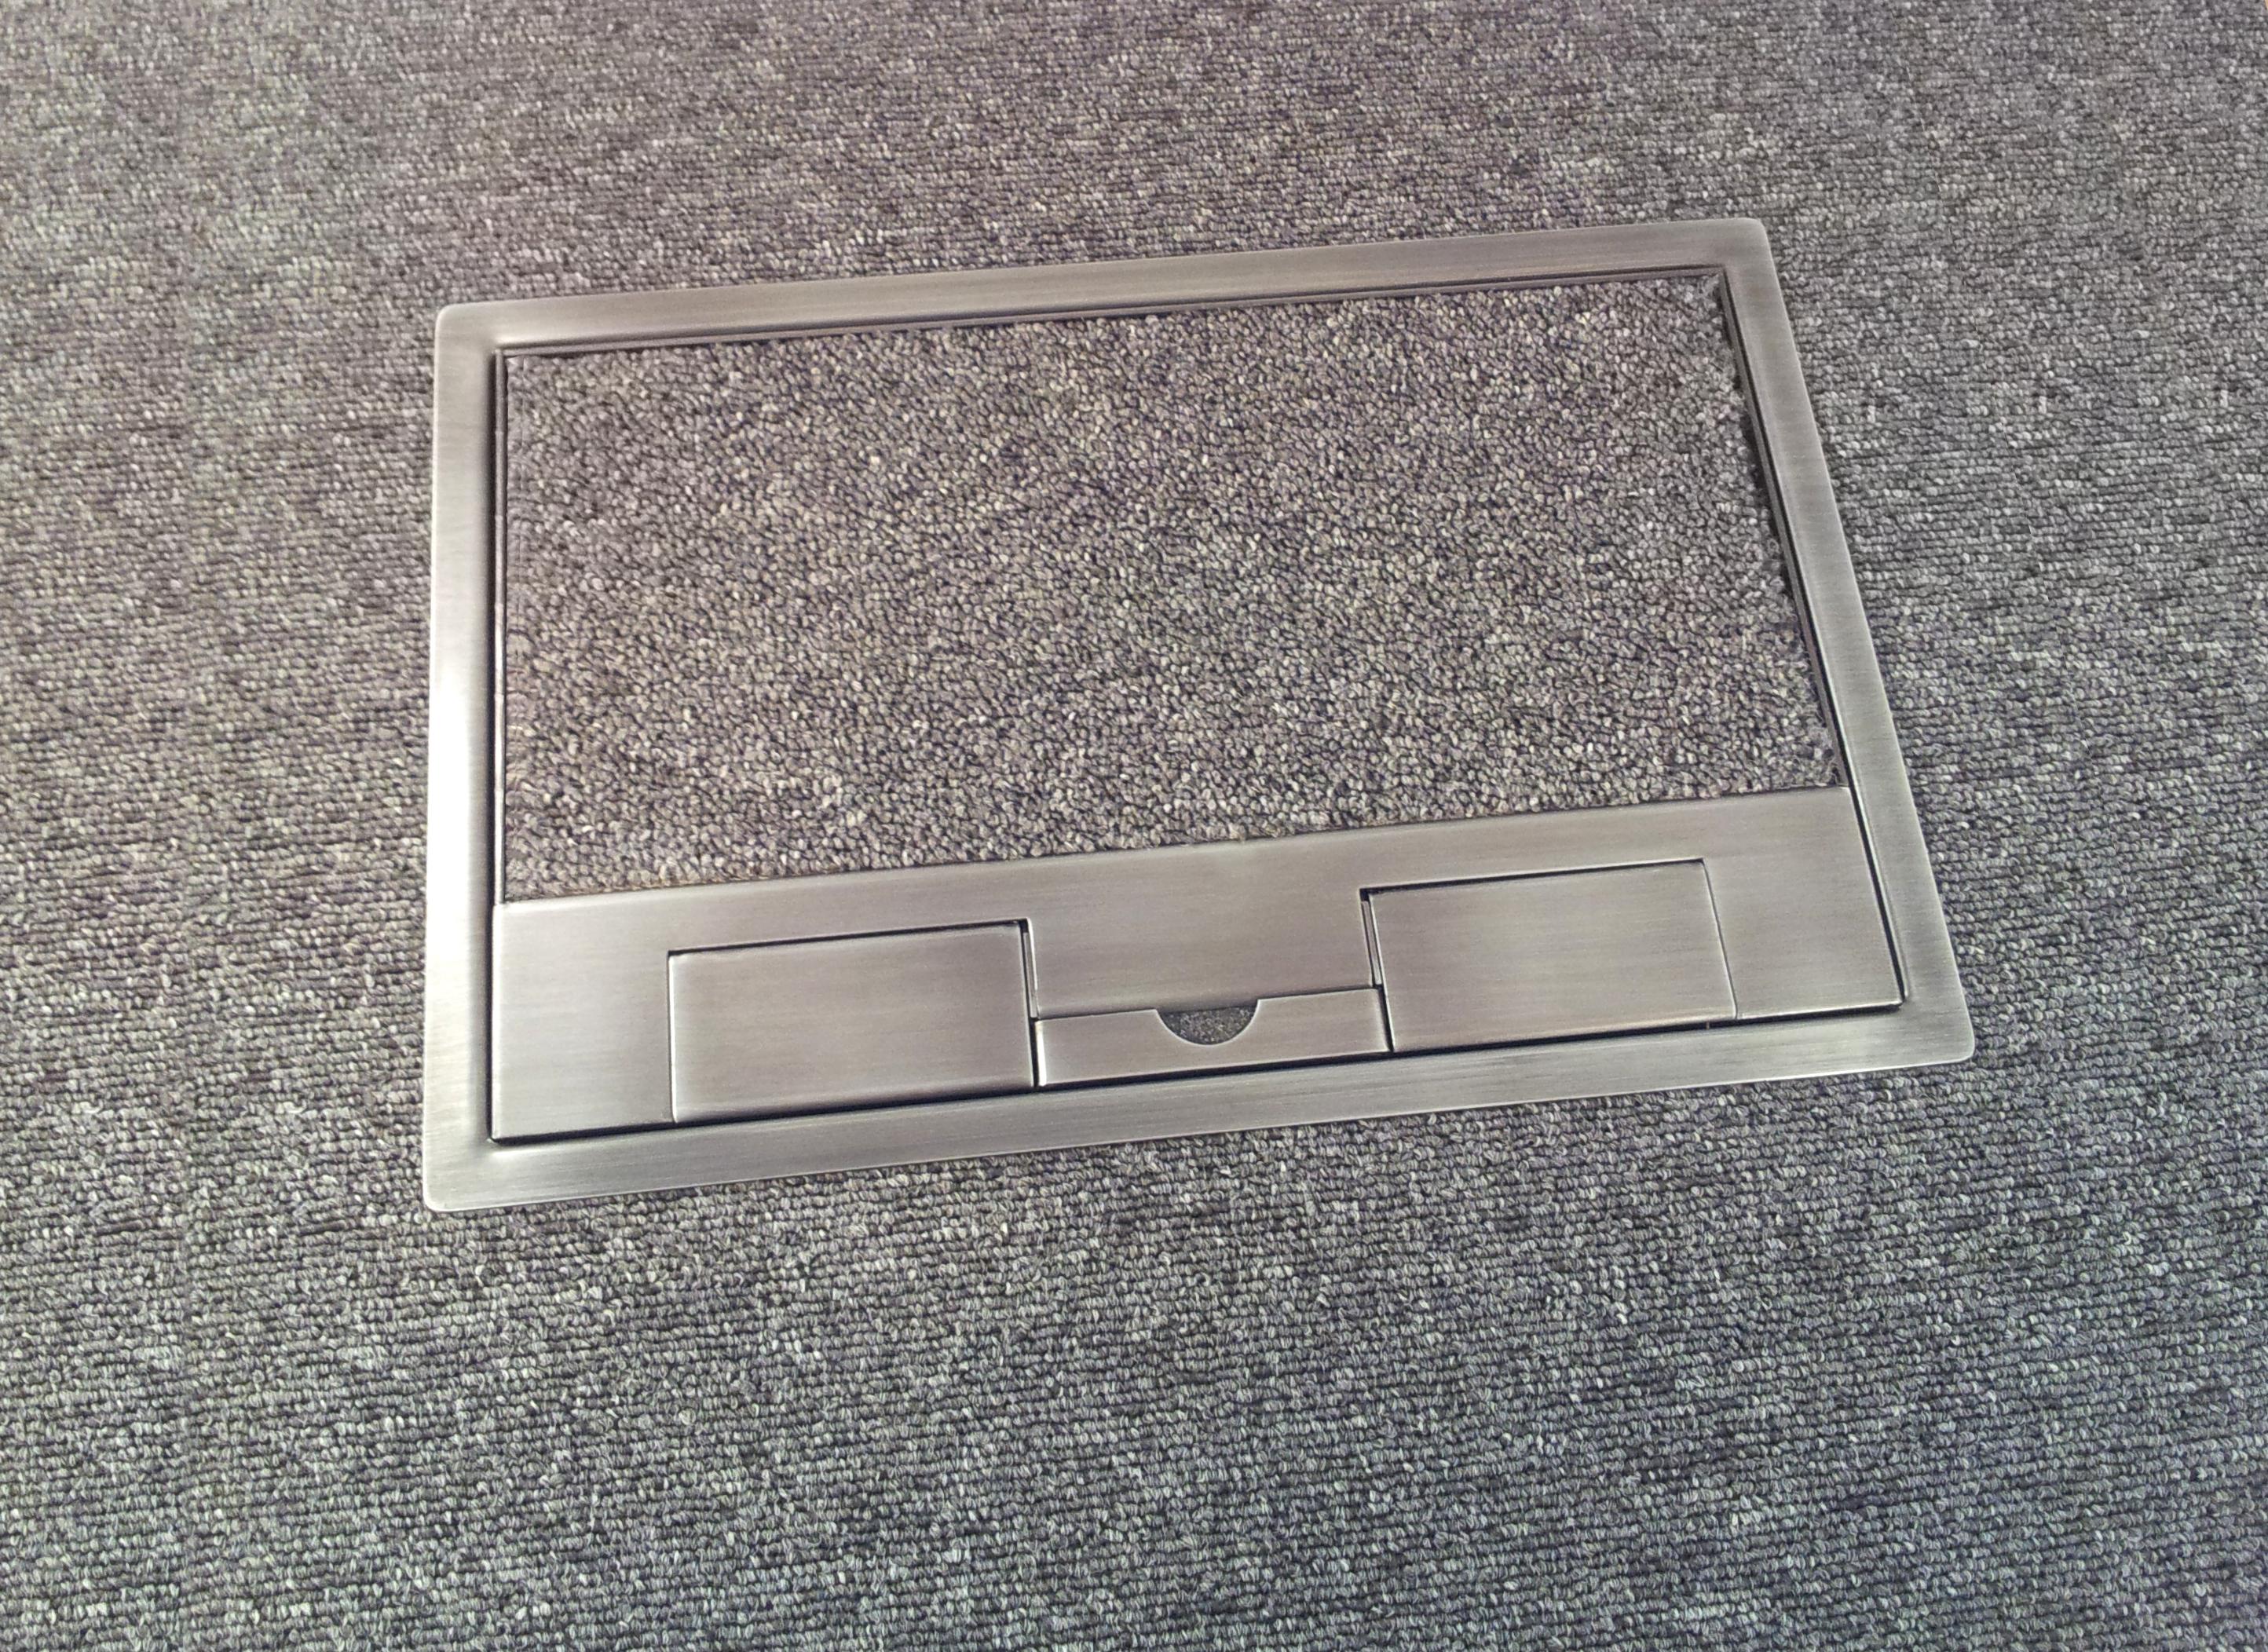 Gazelle Raised Floor Boxes Electropatent